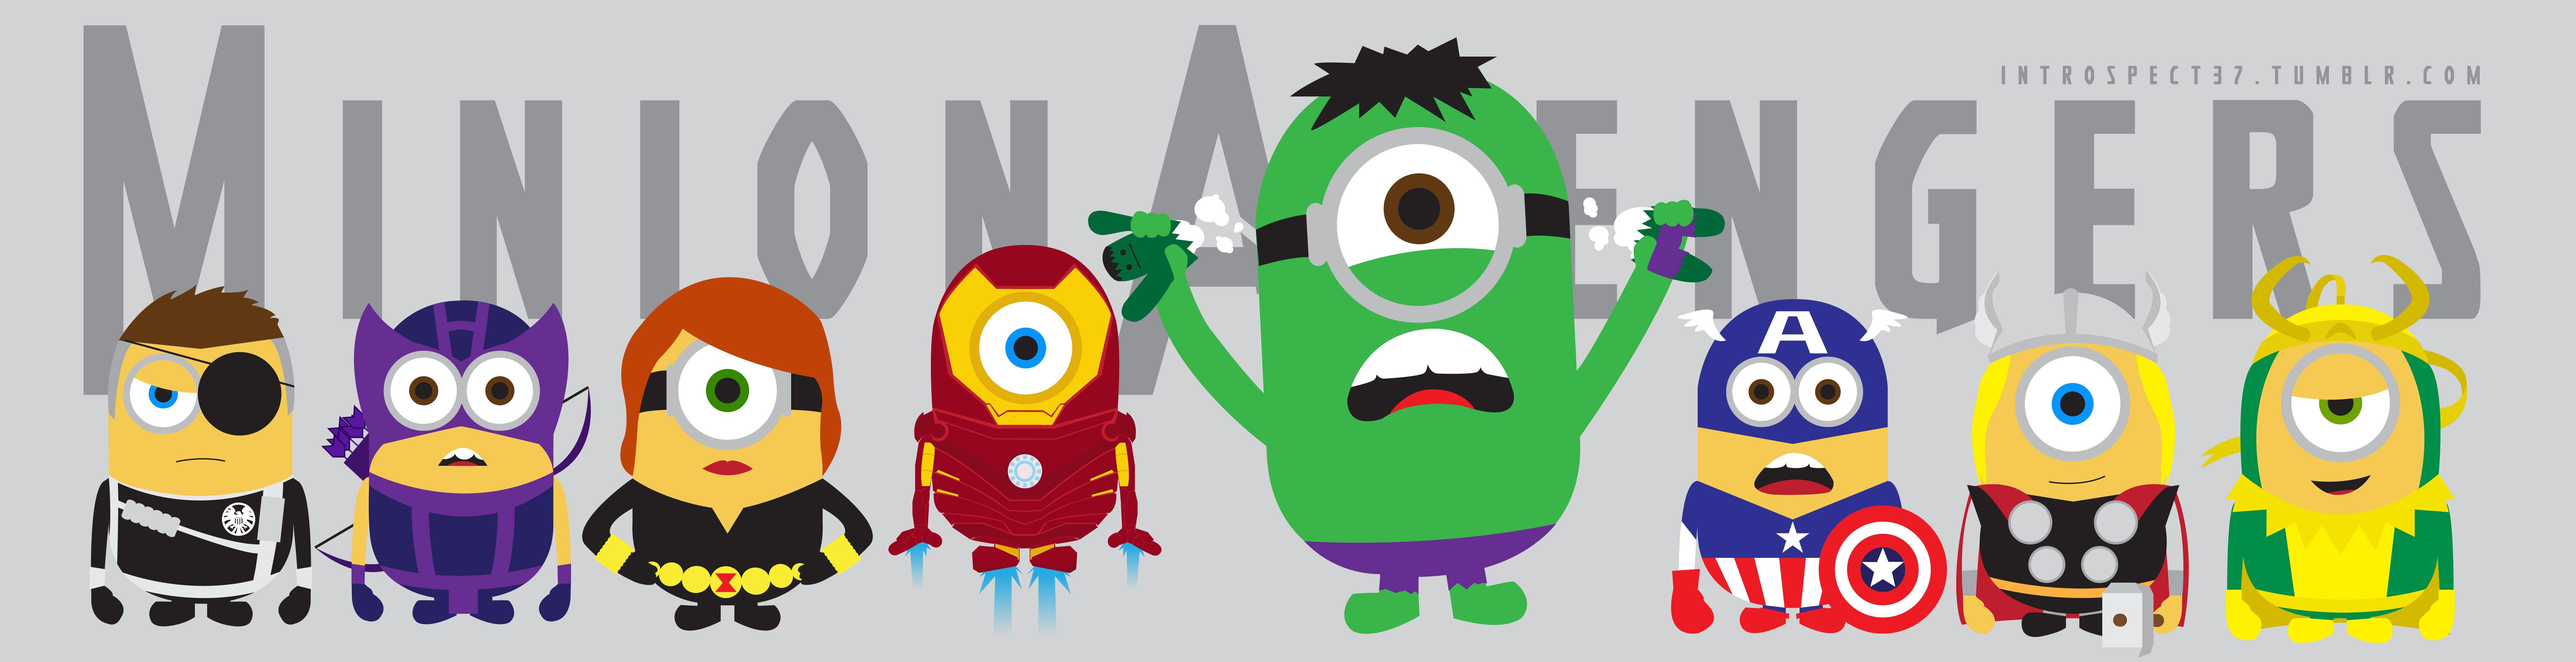 Avengers Assemble! Minion edition | Funnies. | Pinterest